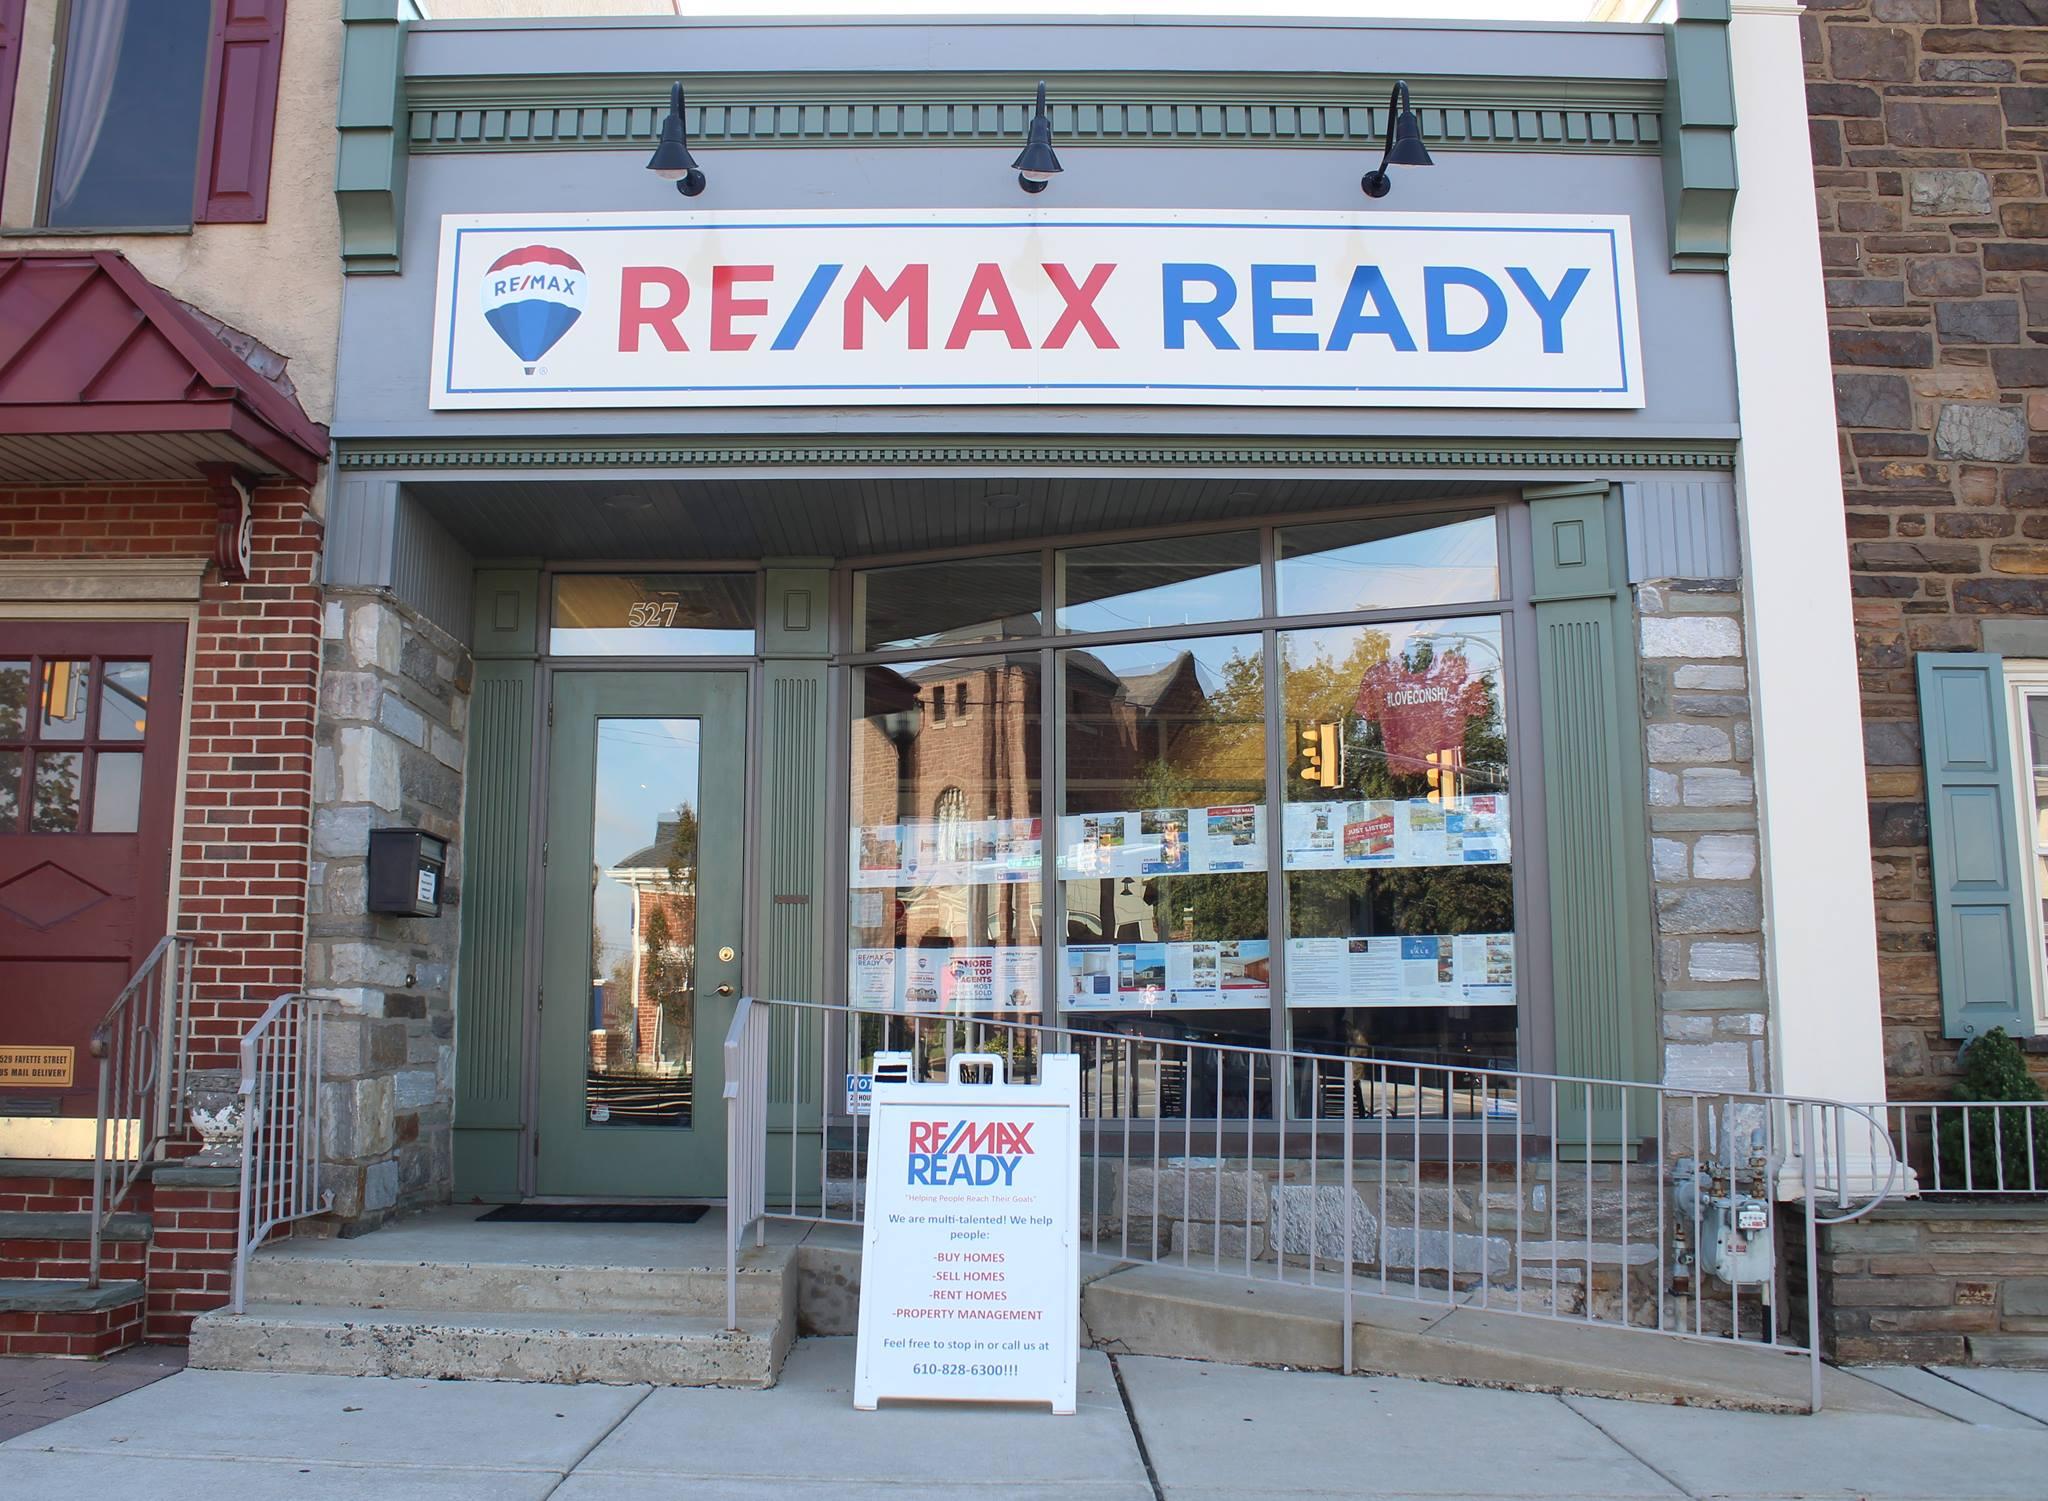 RE/MAX Ready